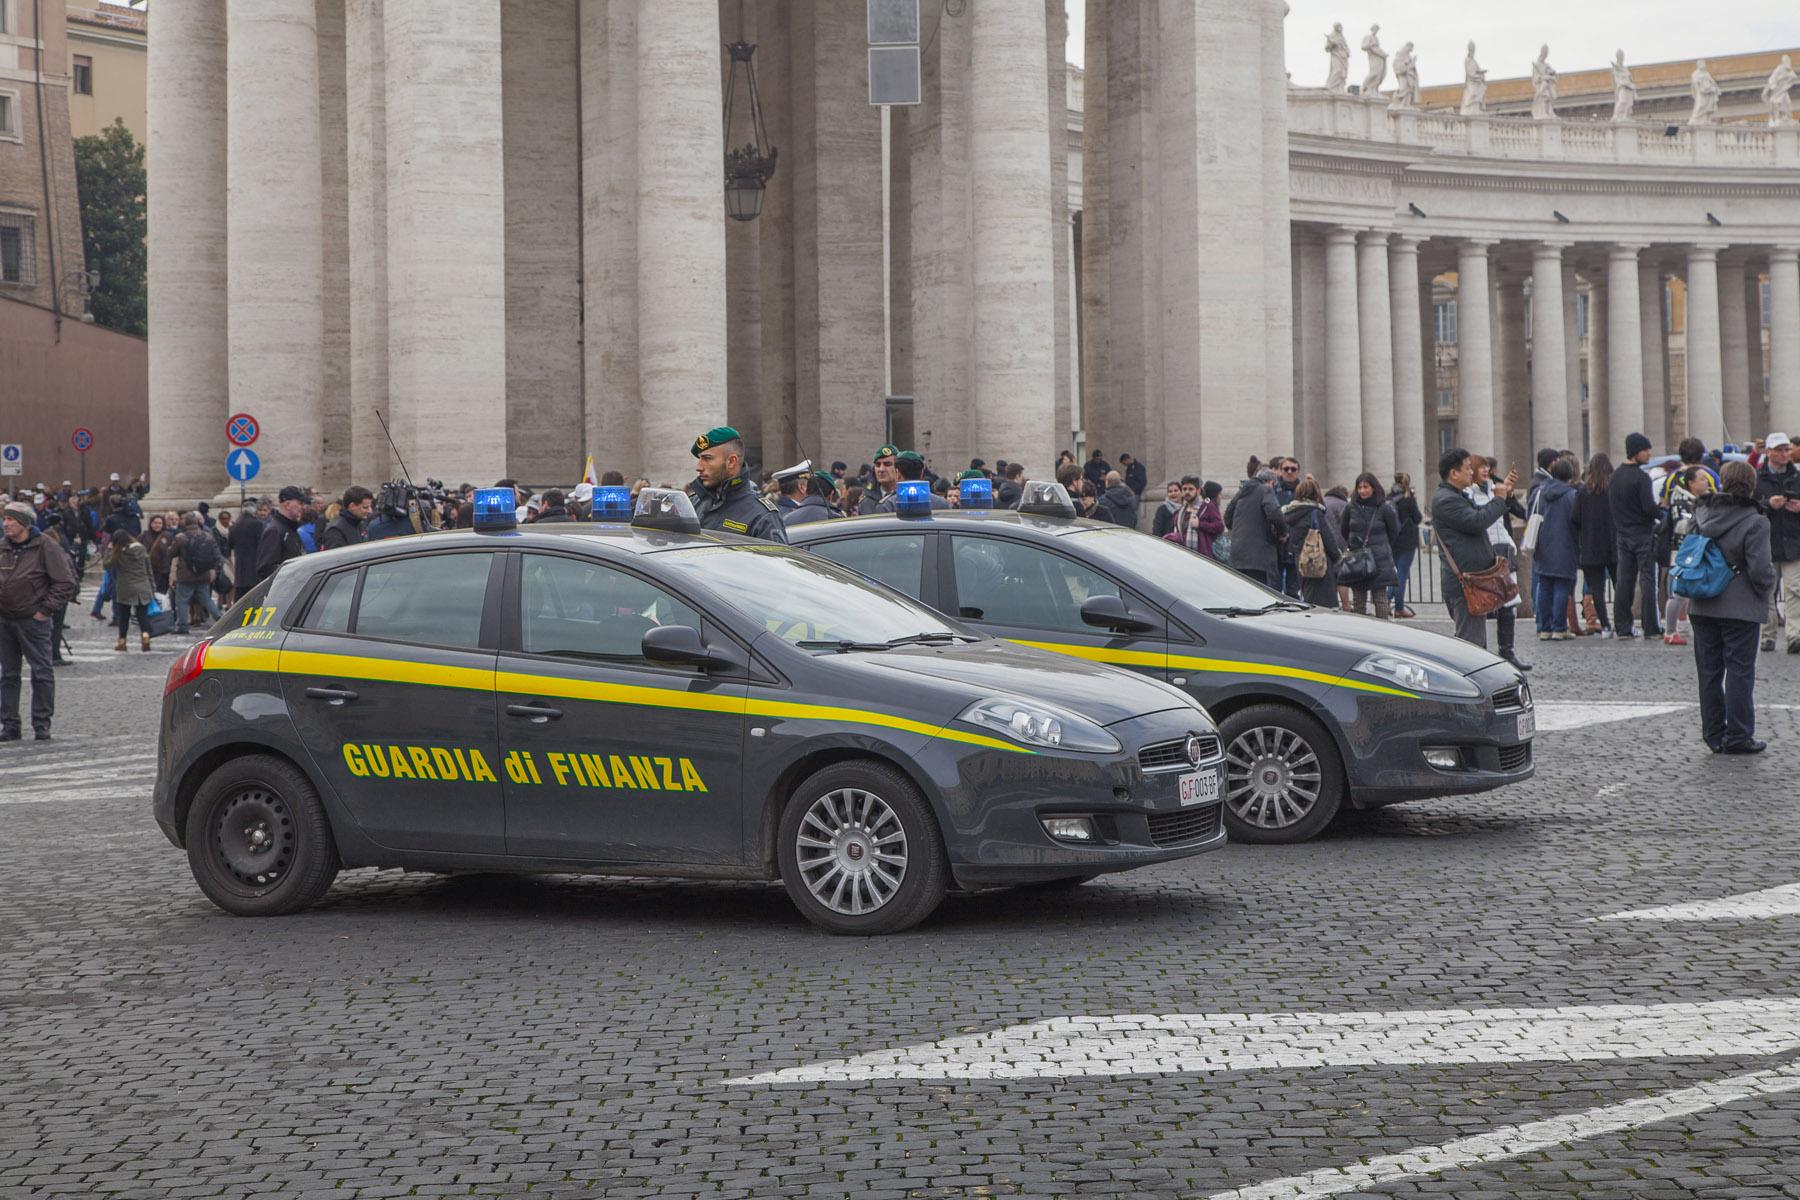 Chiara Spaghetti Kurtovic Popes Two 5